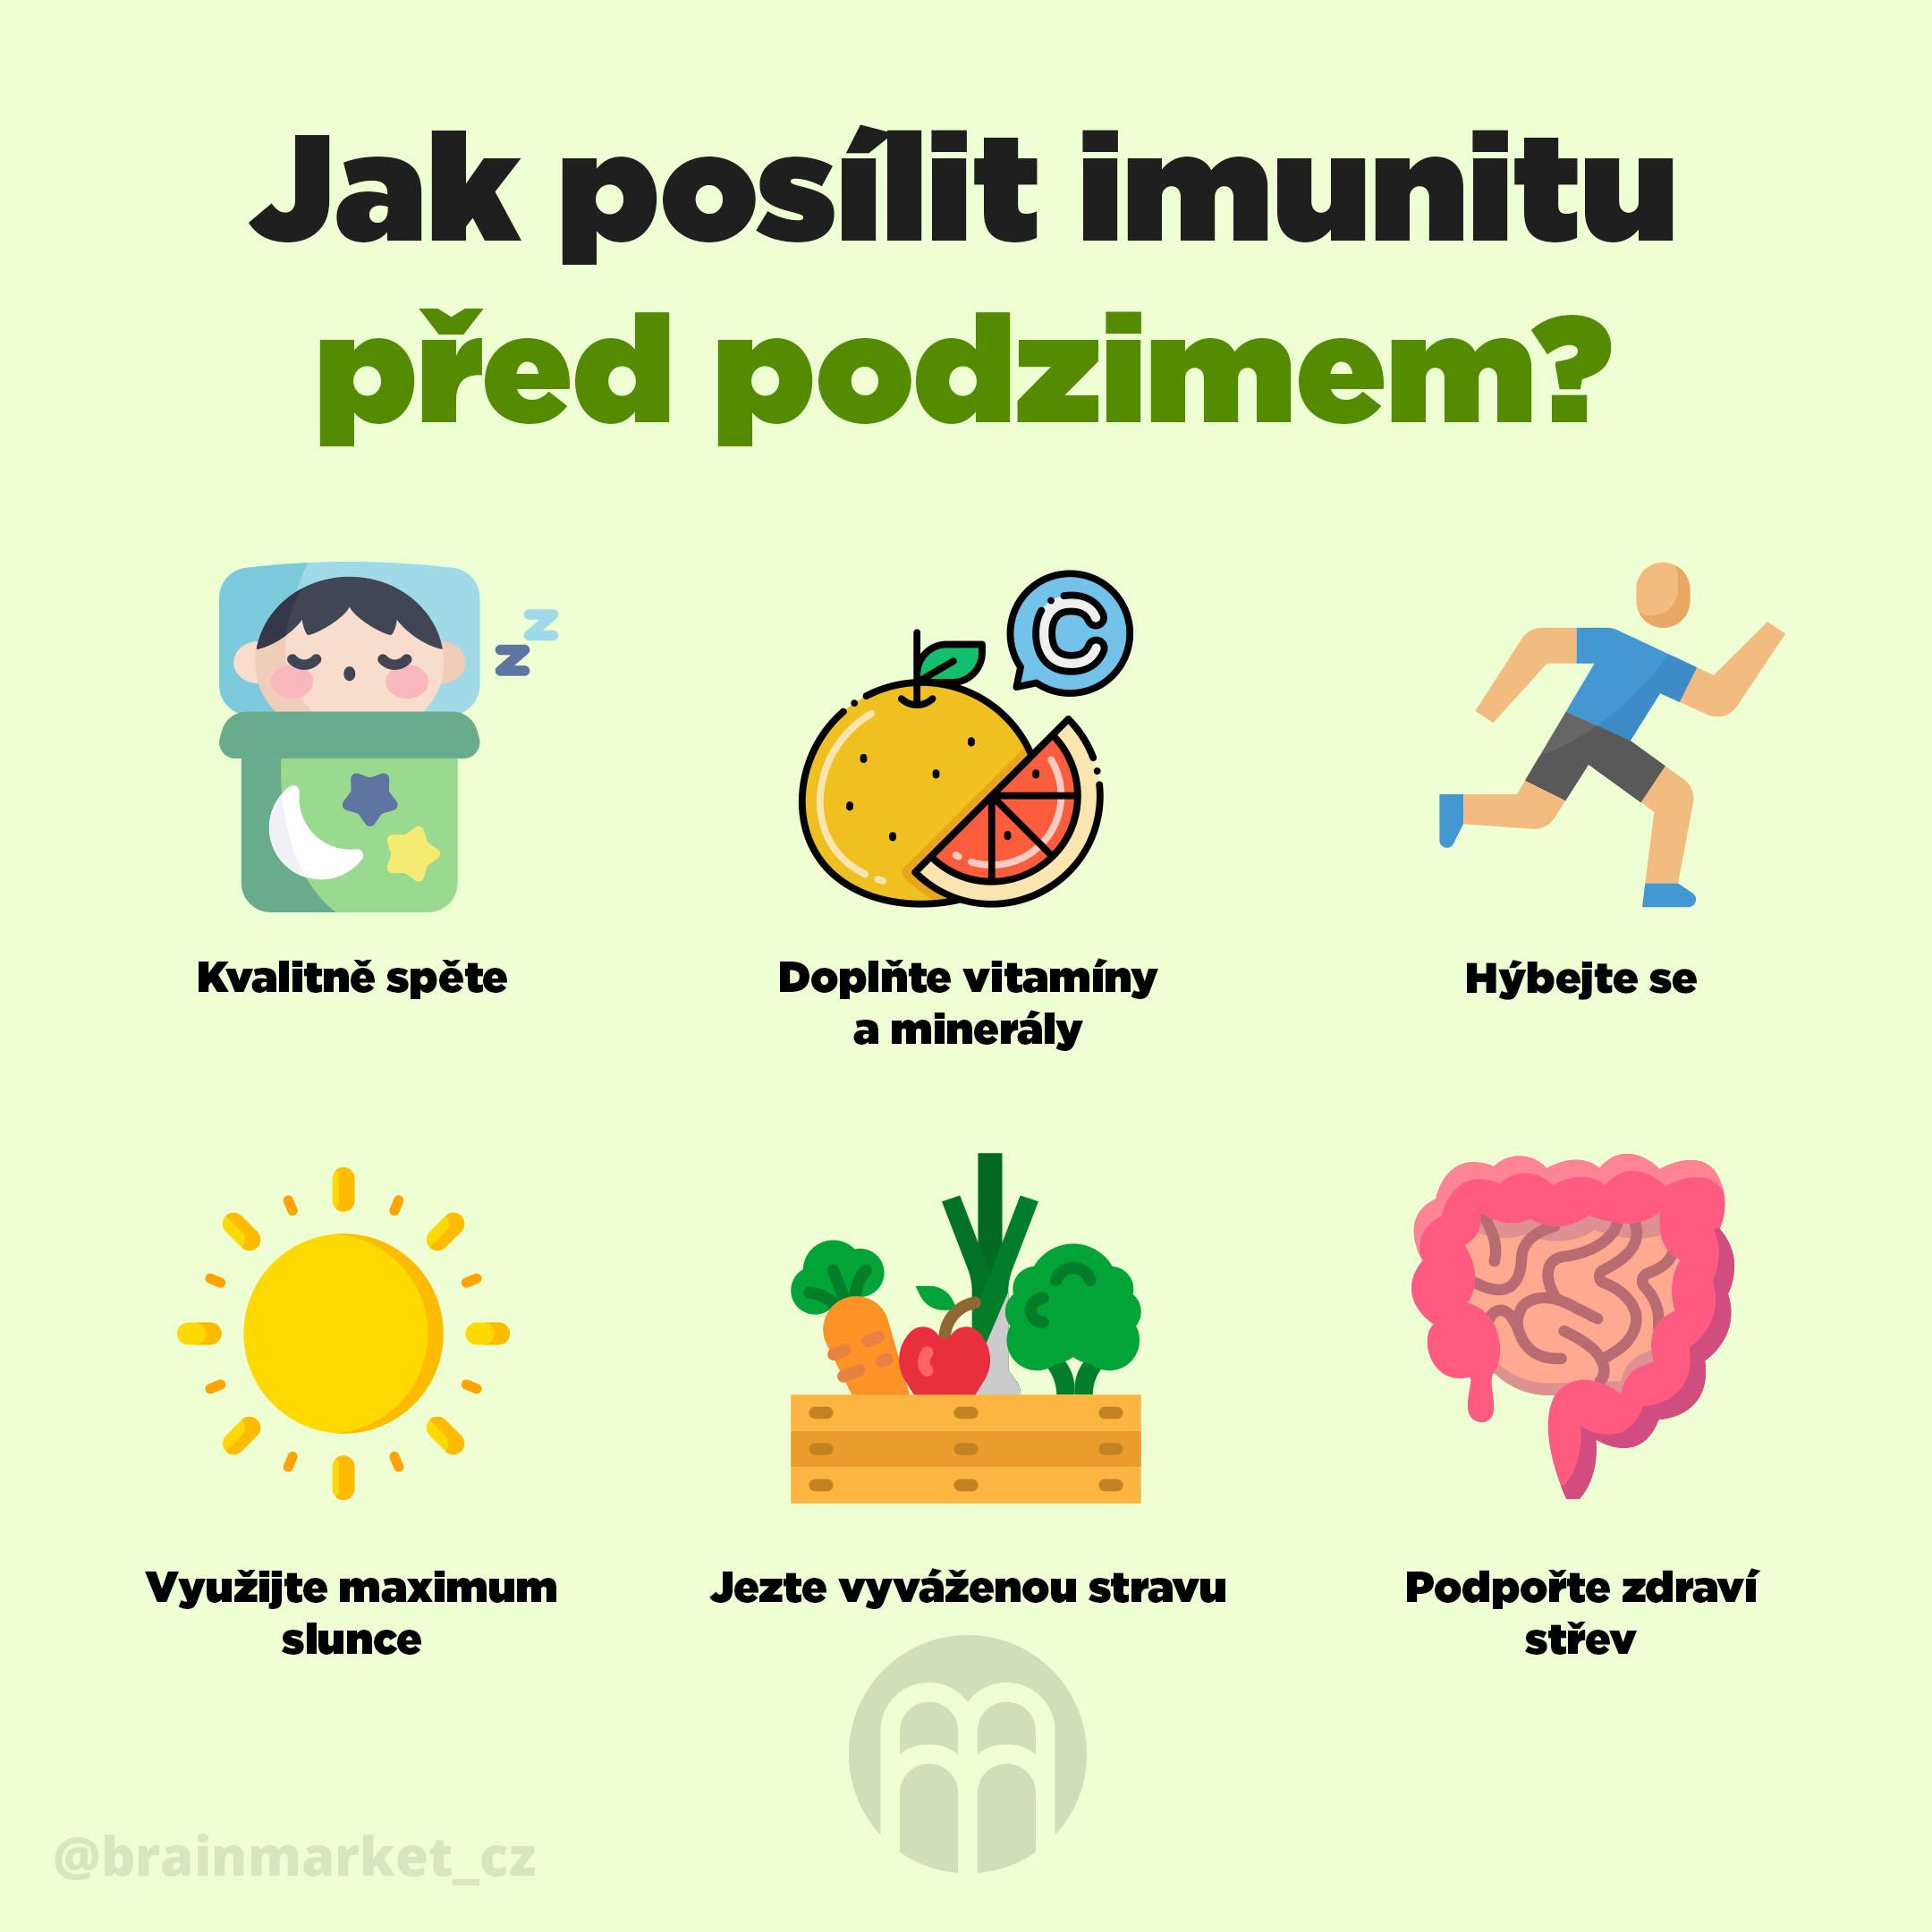 jak_posilit_imunitu_pred_podzimem_Infografika-BrainMarket-2